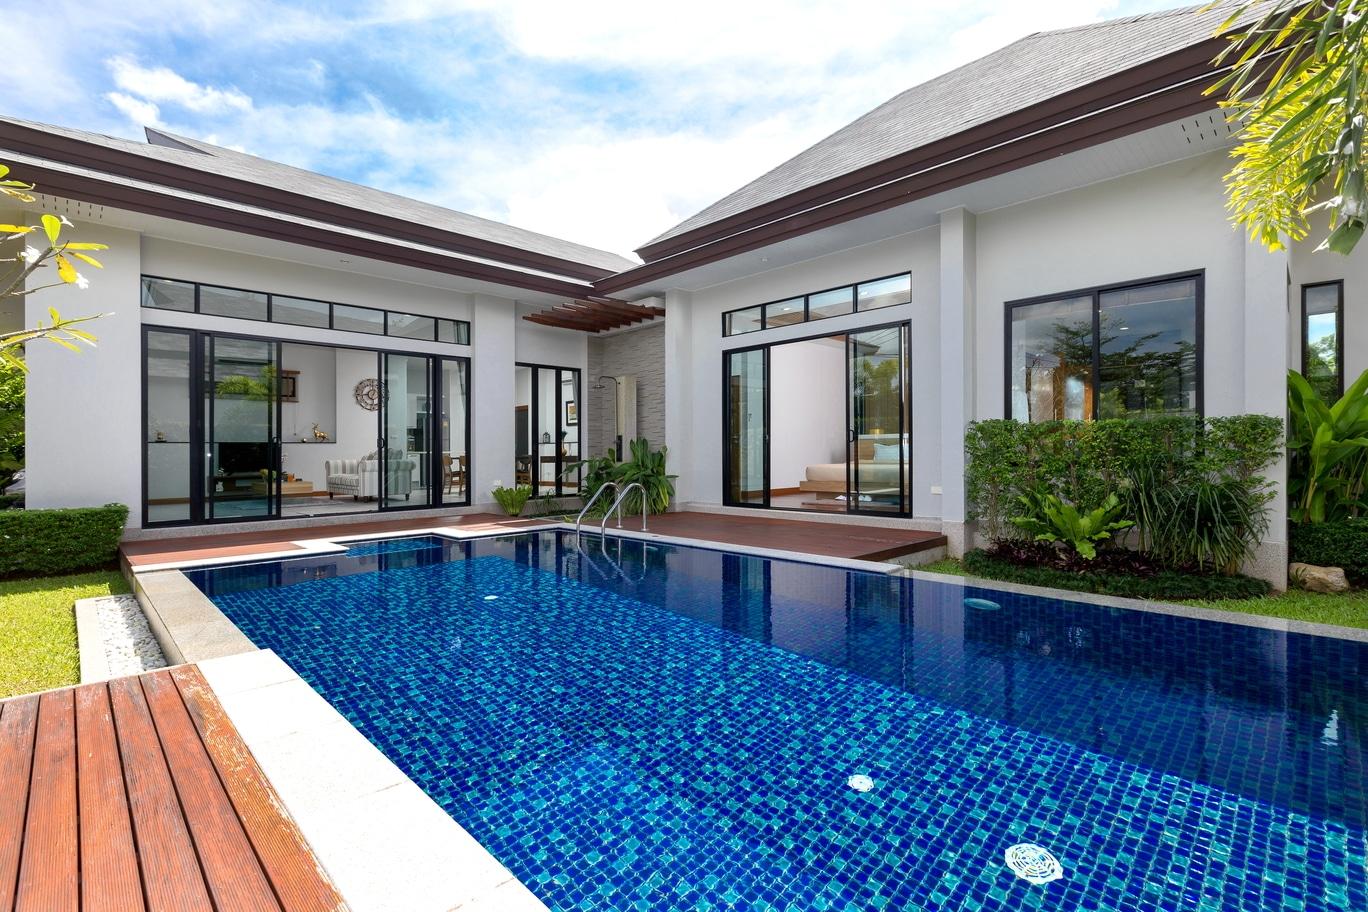 Tanode villa last unit for sale in Bangtao Beach